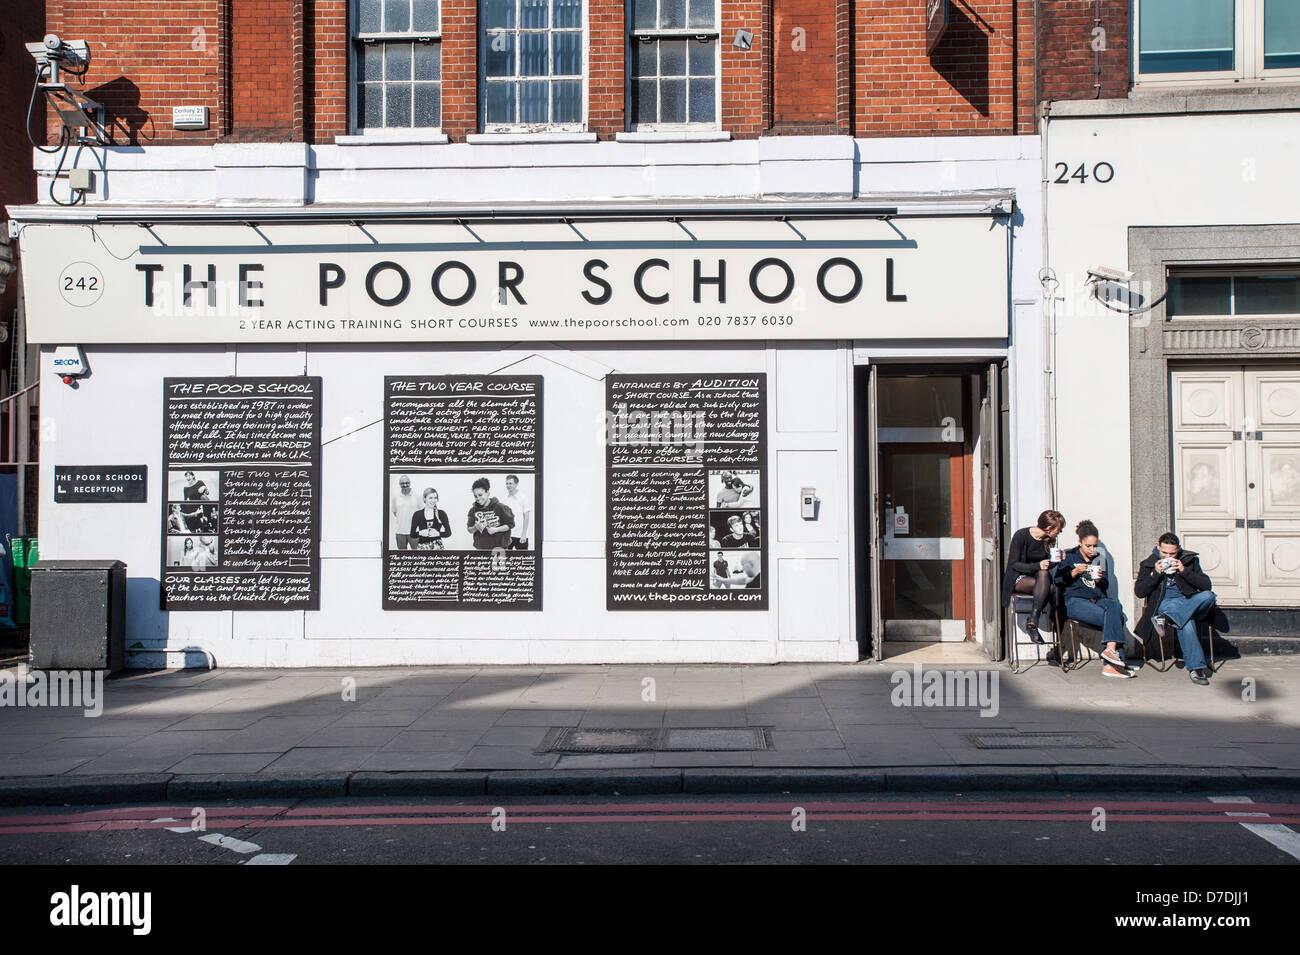 The Poor School building, Kings Cross area, London, United Kingdom - Stock Image